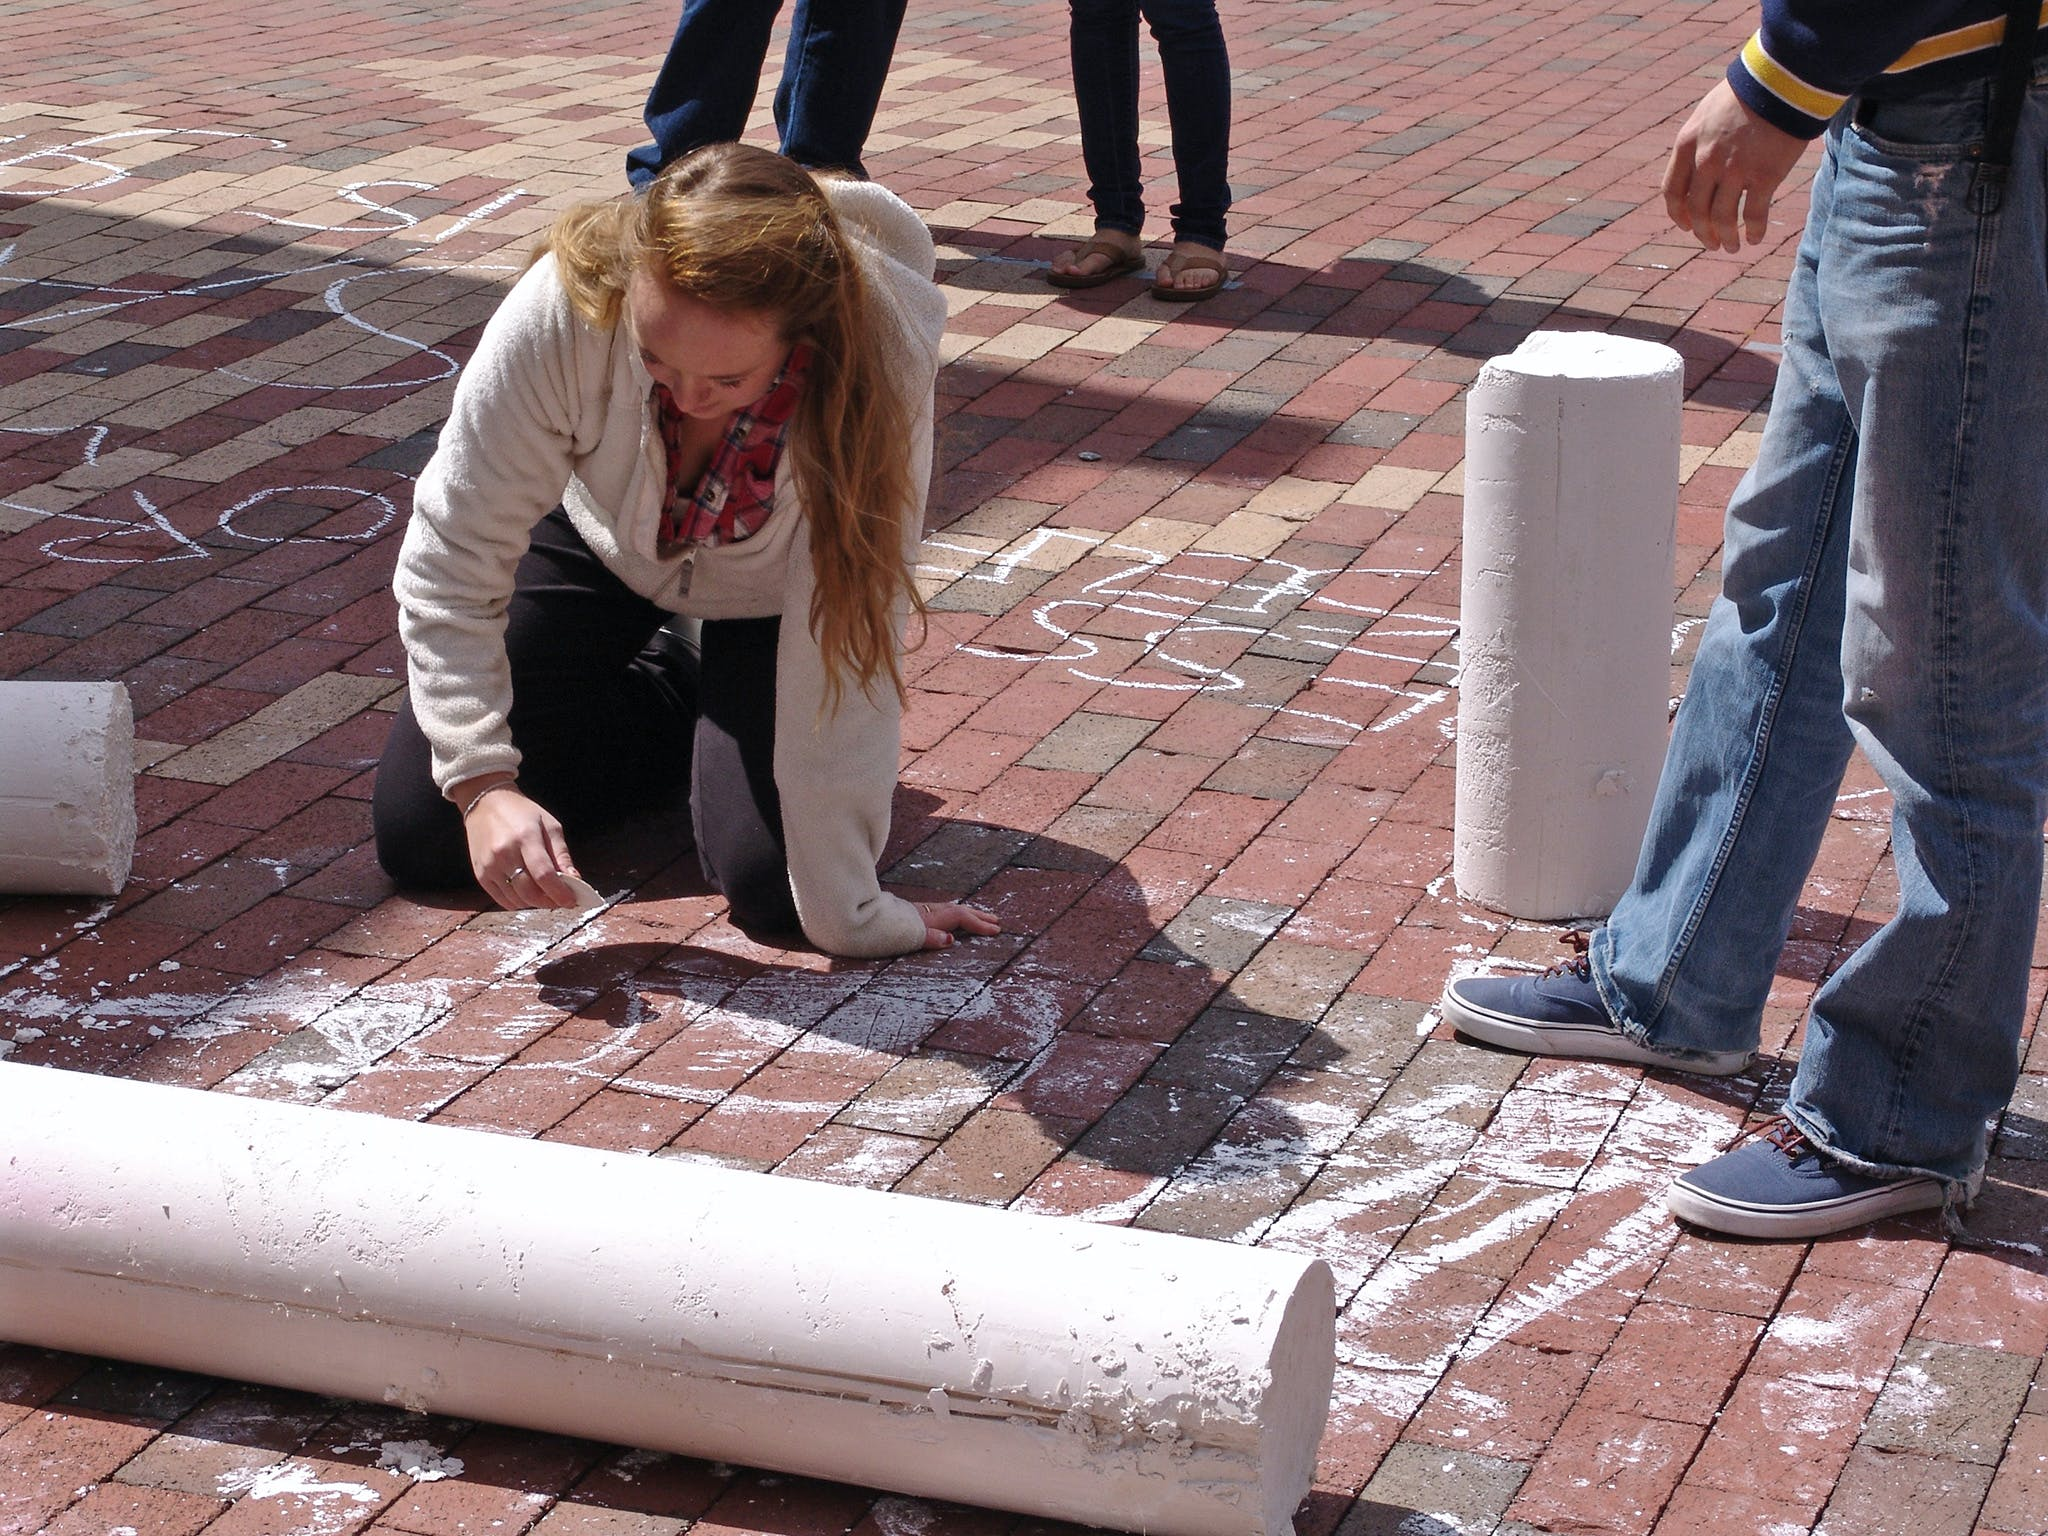 Woman writing on brick ground with white chalk.